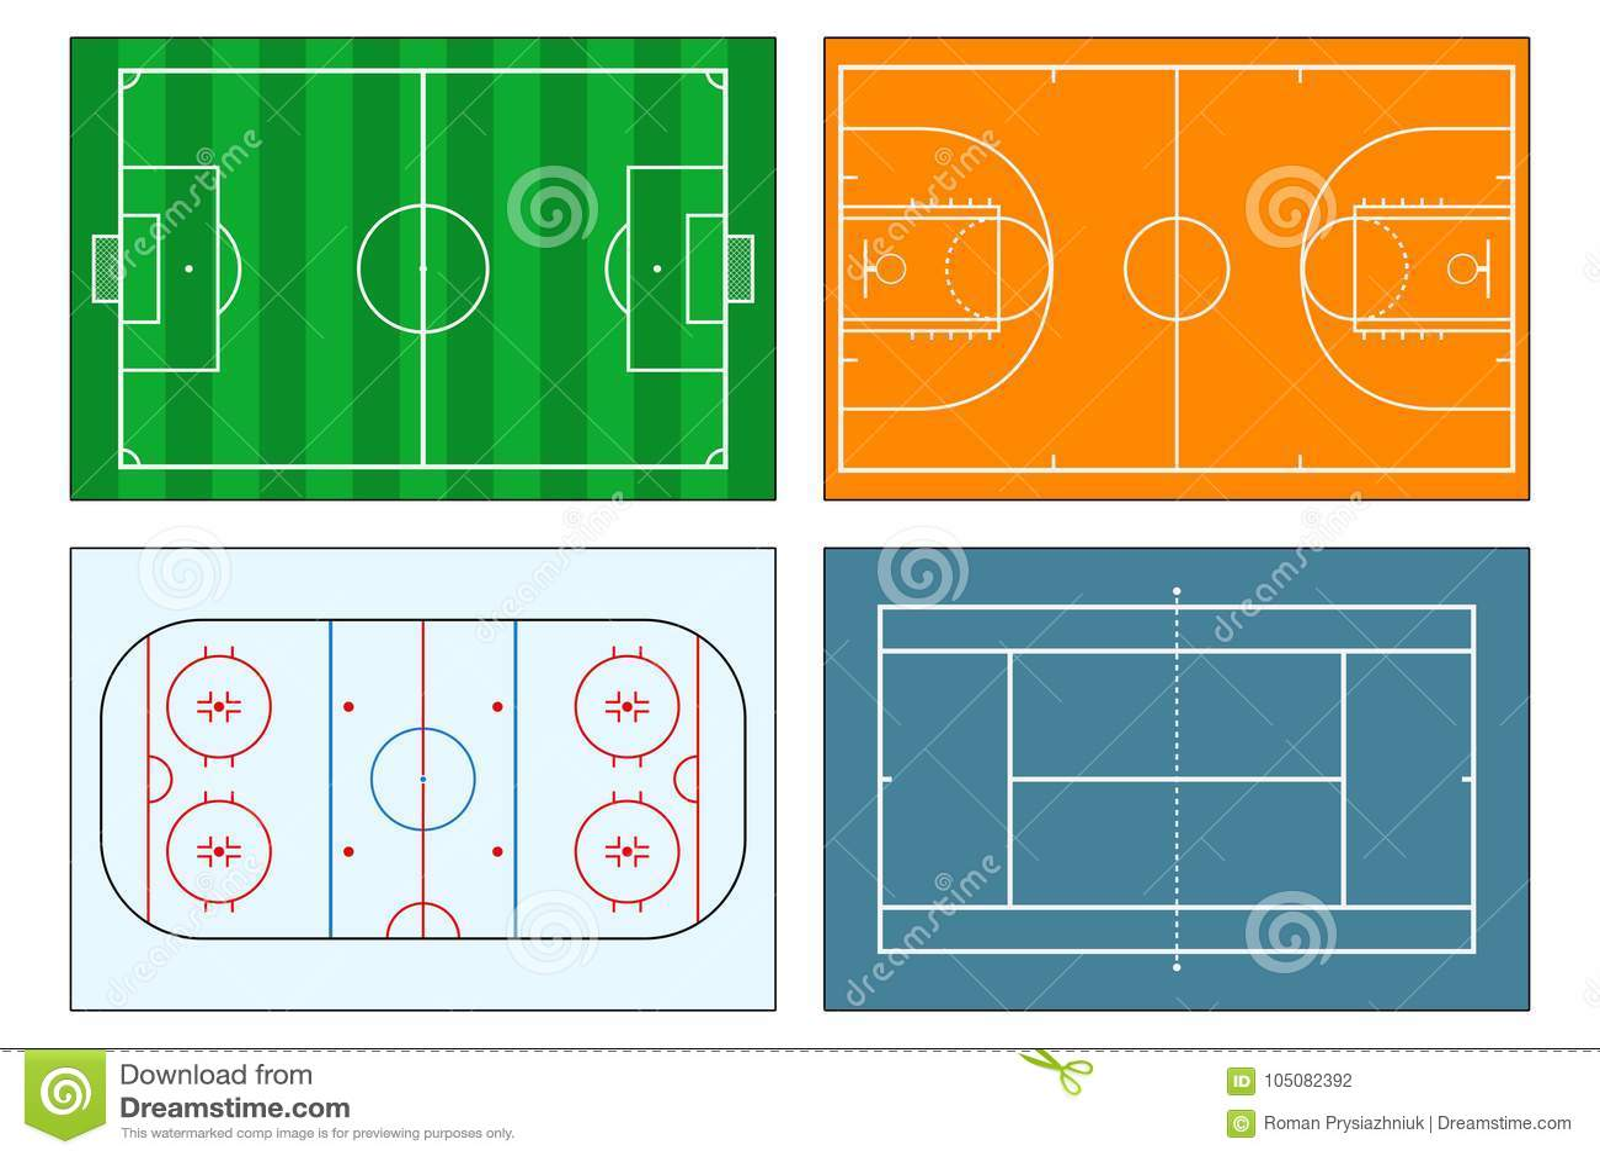 Color Sport Background Football Basketball Hockey Stock: Football Field Scheme Cartoon Vector